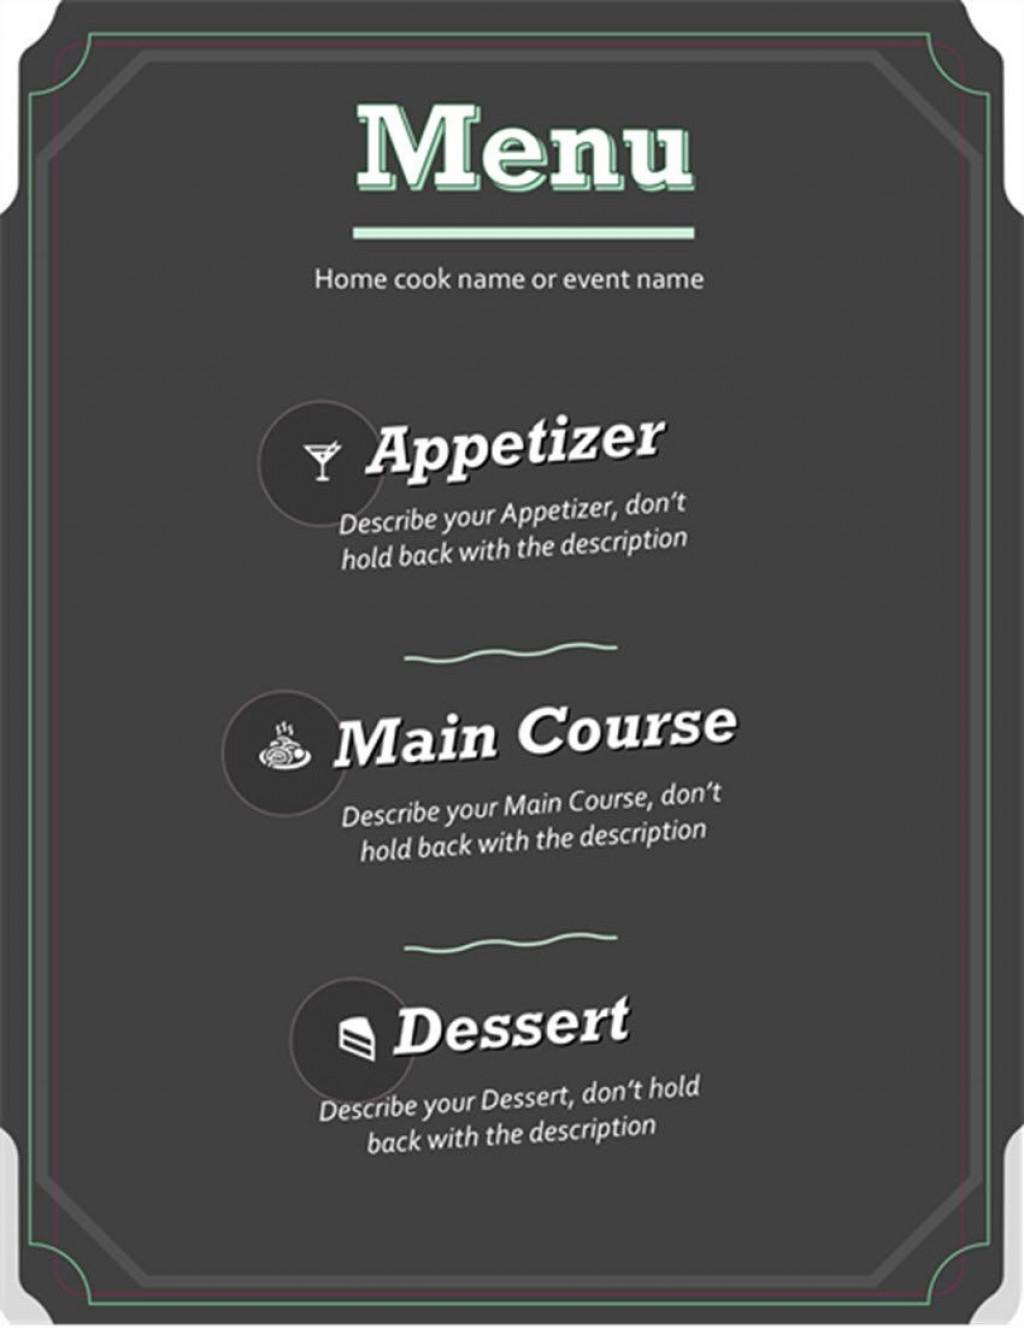 001 Imposing Restaurant Menu Template Free Download Idea Large